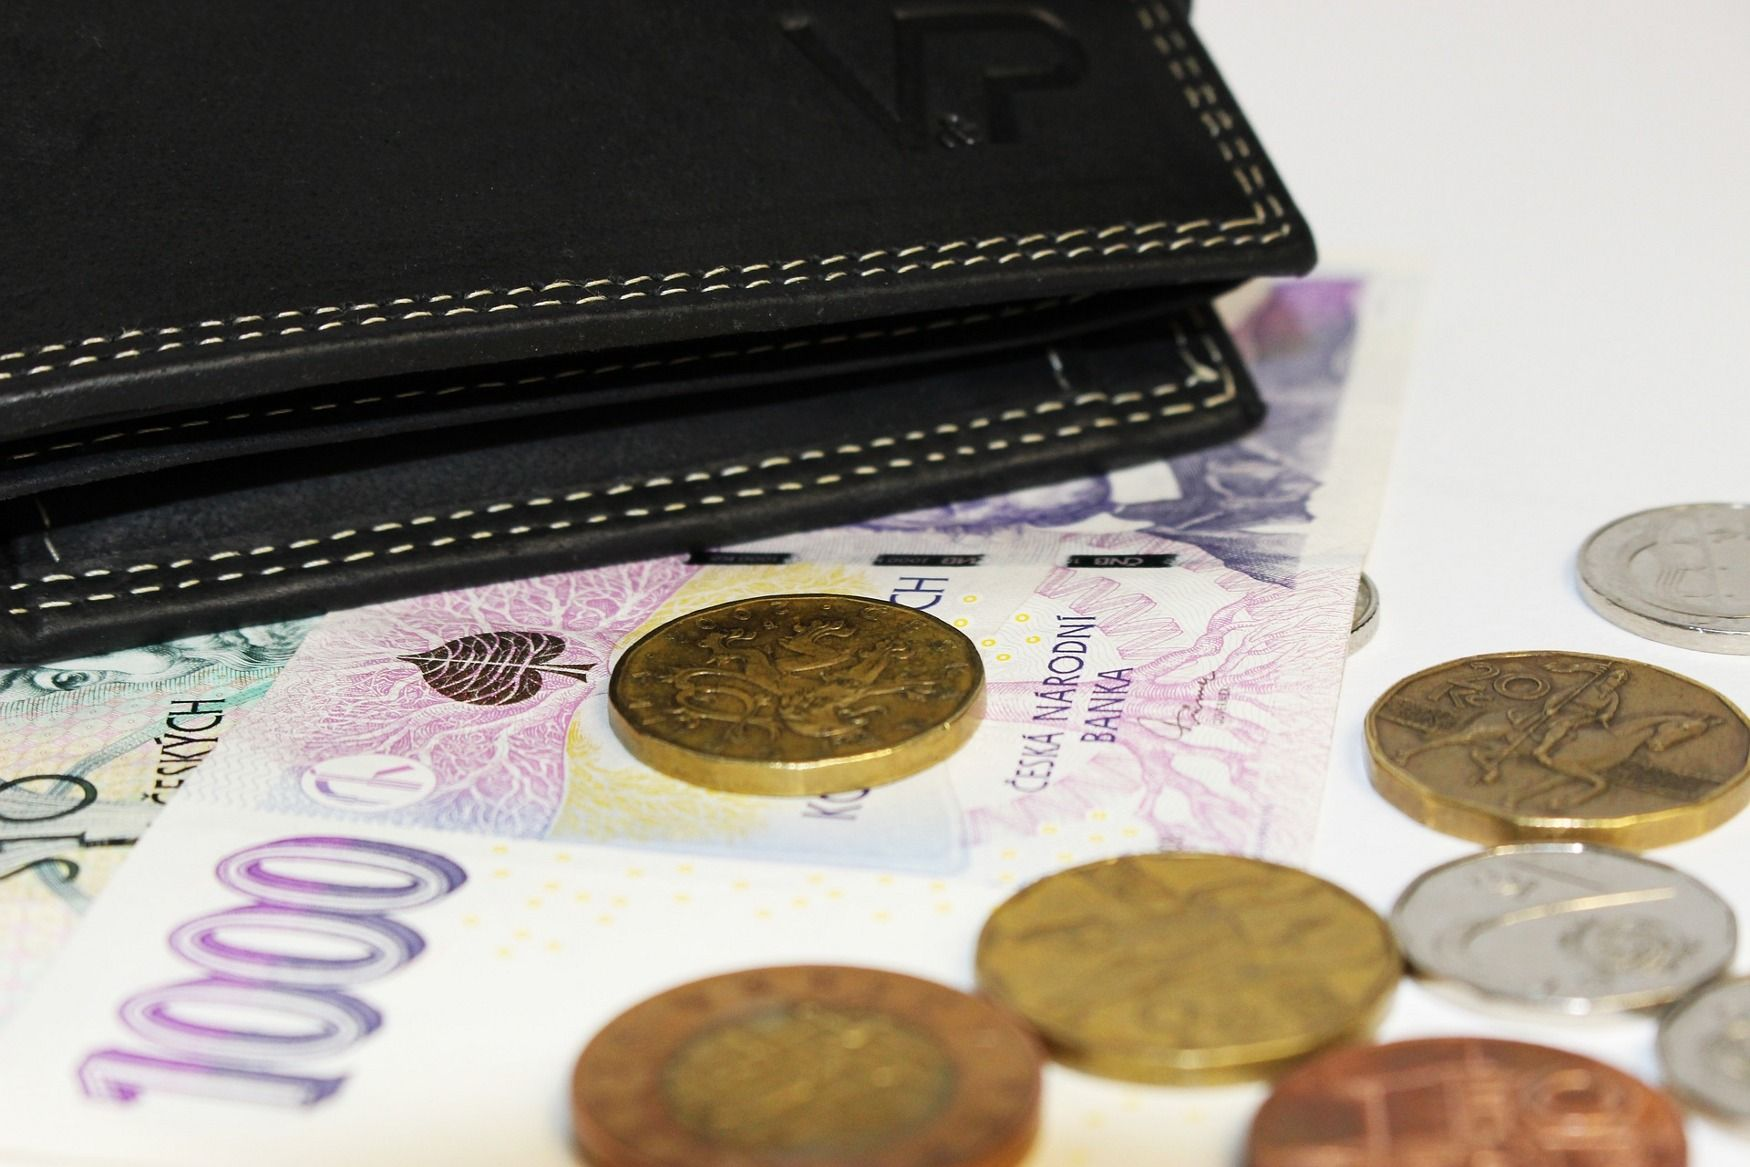 Czechs' financial literacy far from stellar, says survey